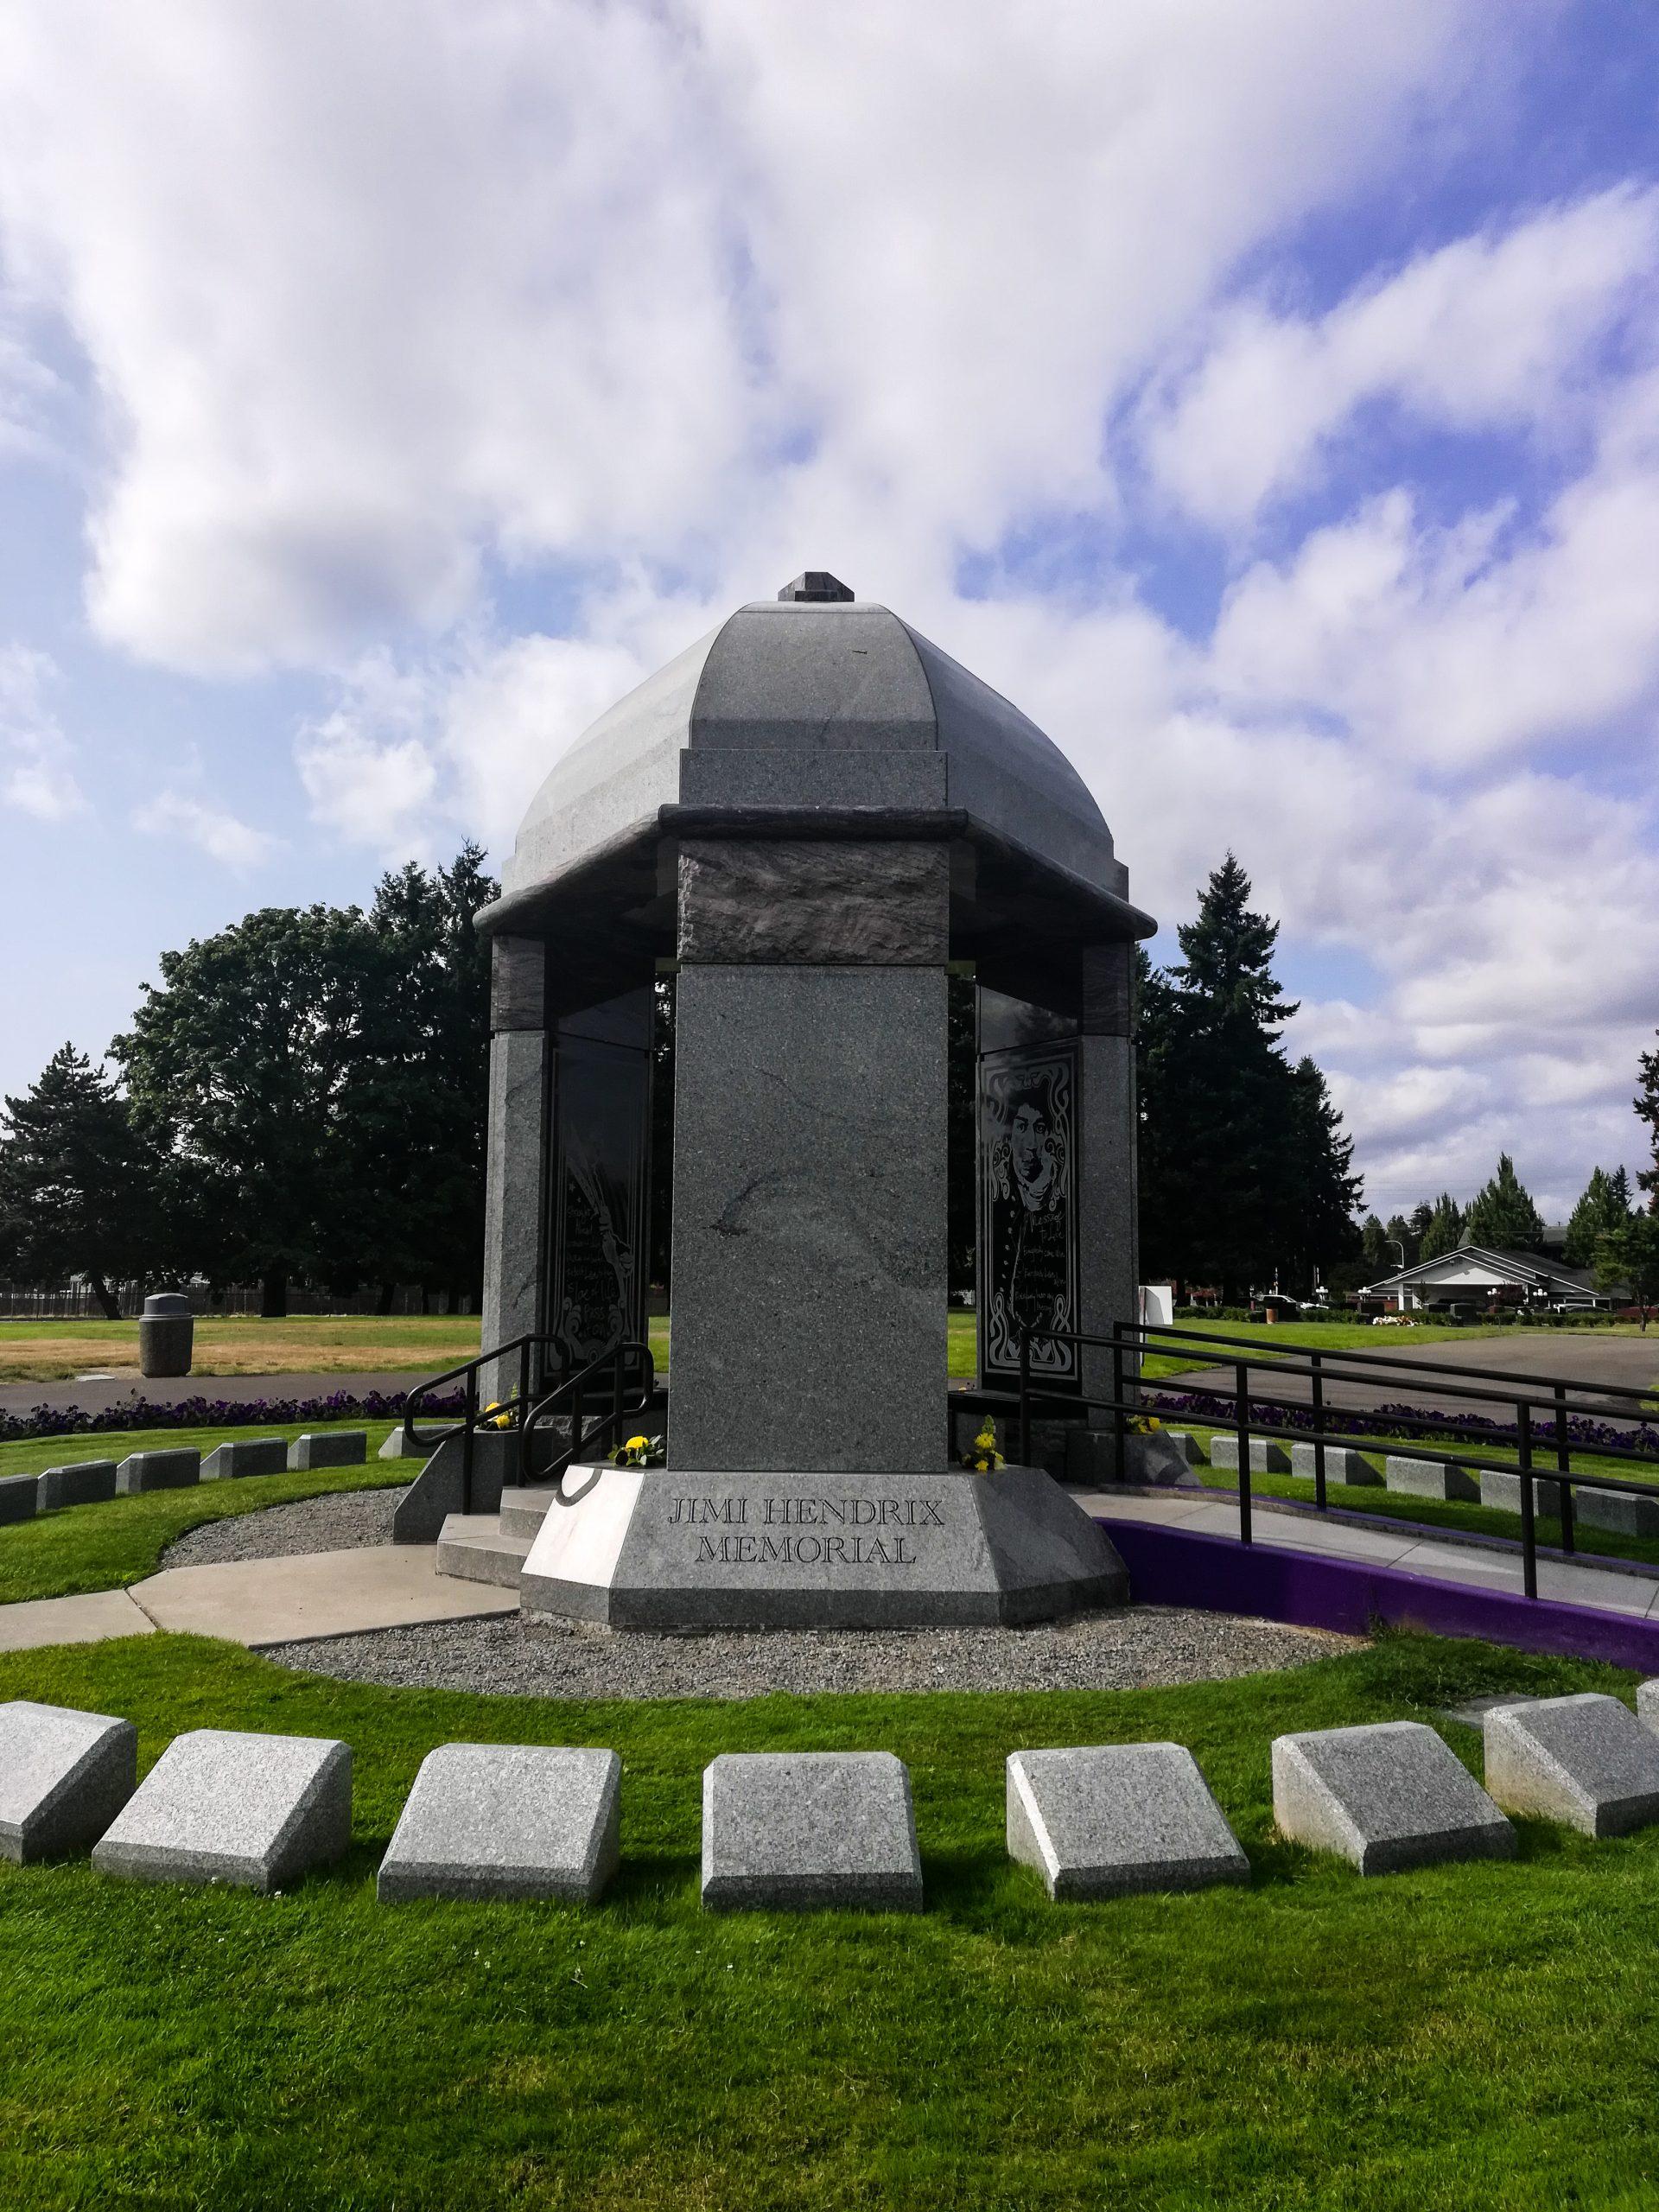 Jimi Hendrix Memorial Renton Seattle